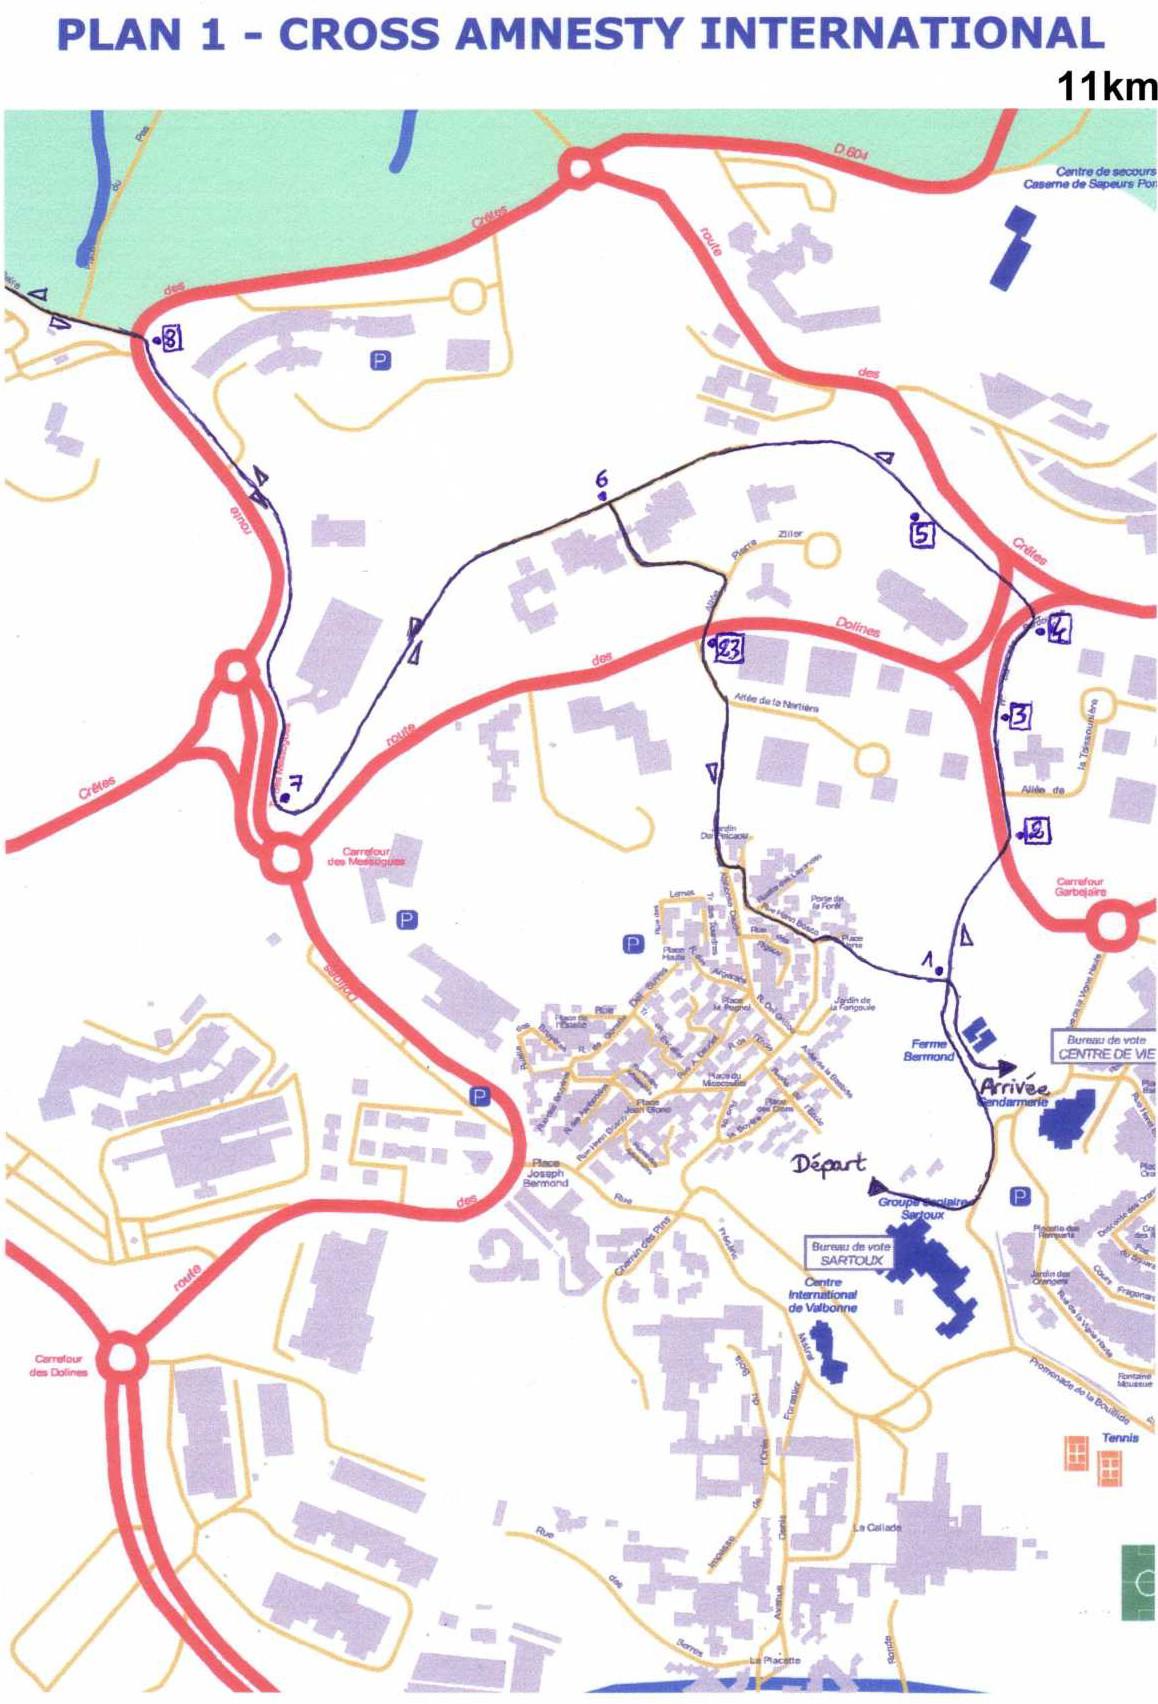 Zoom partie 1 du 11km